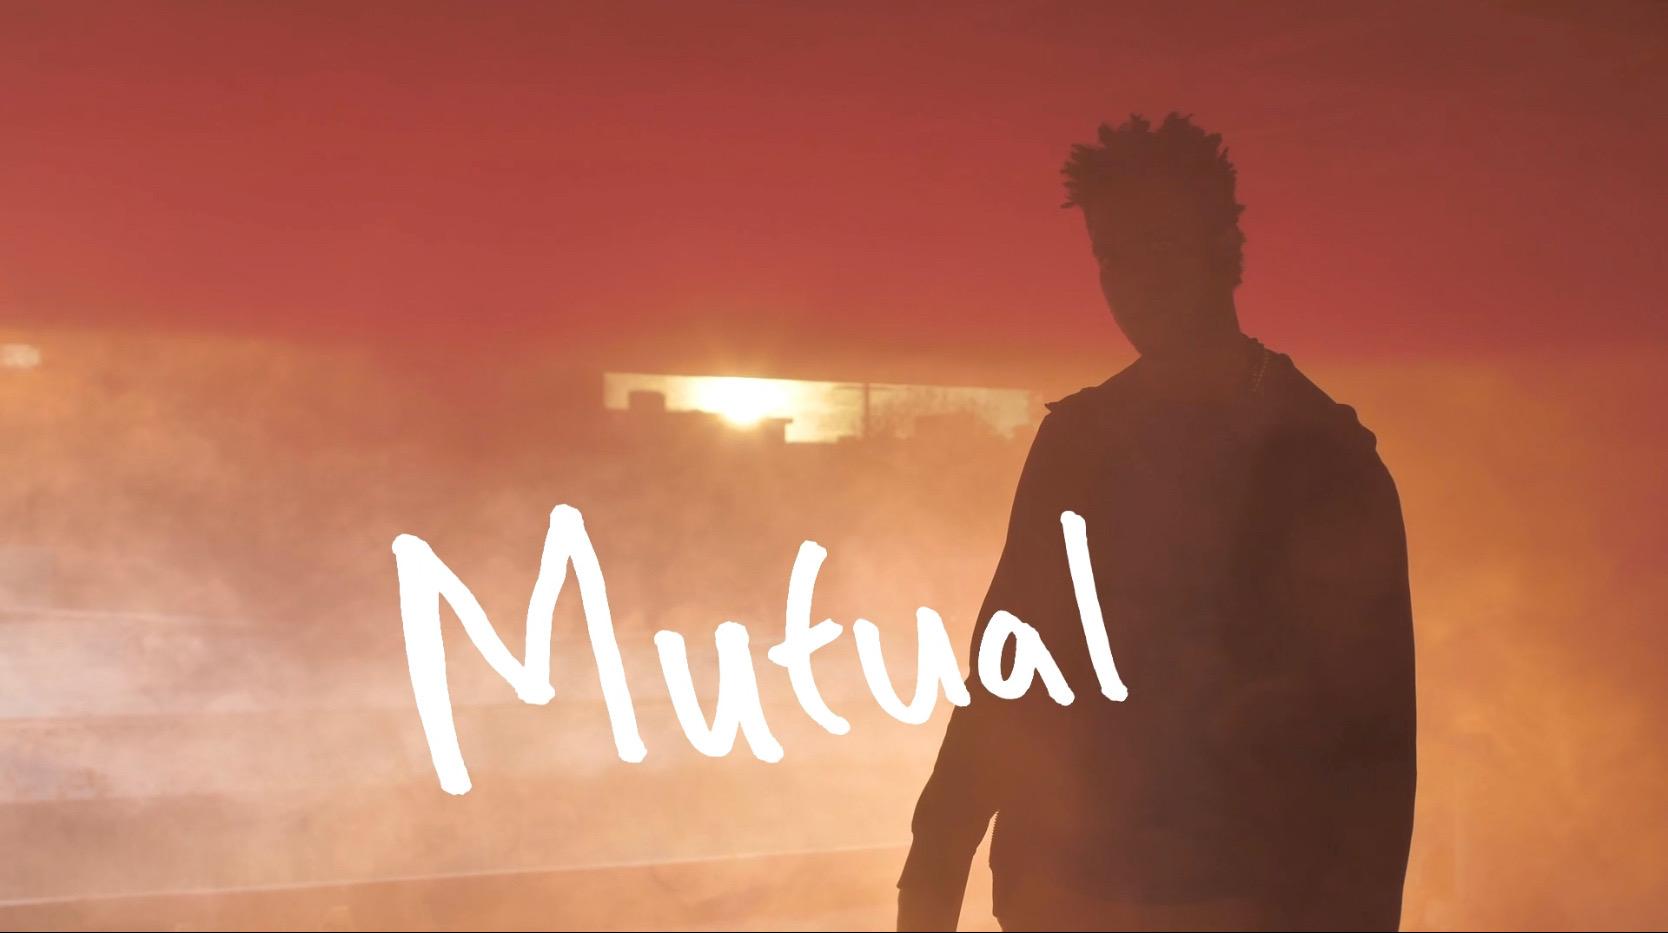 Mutual cover